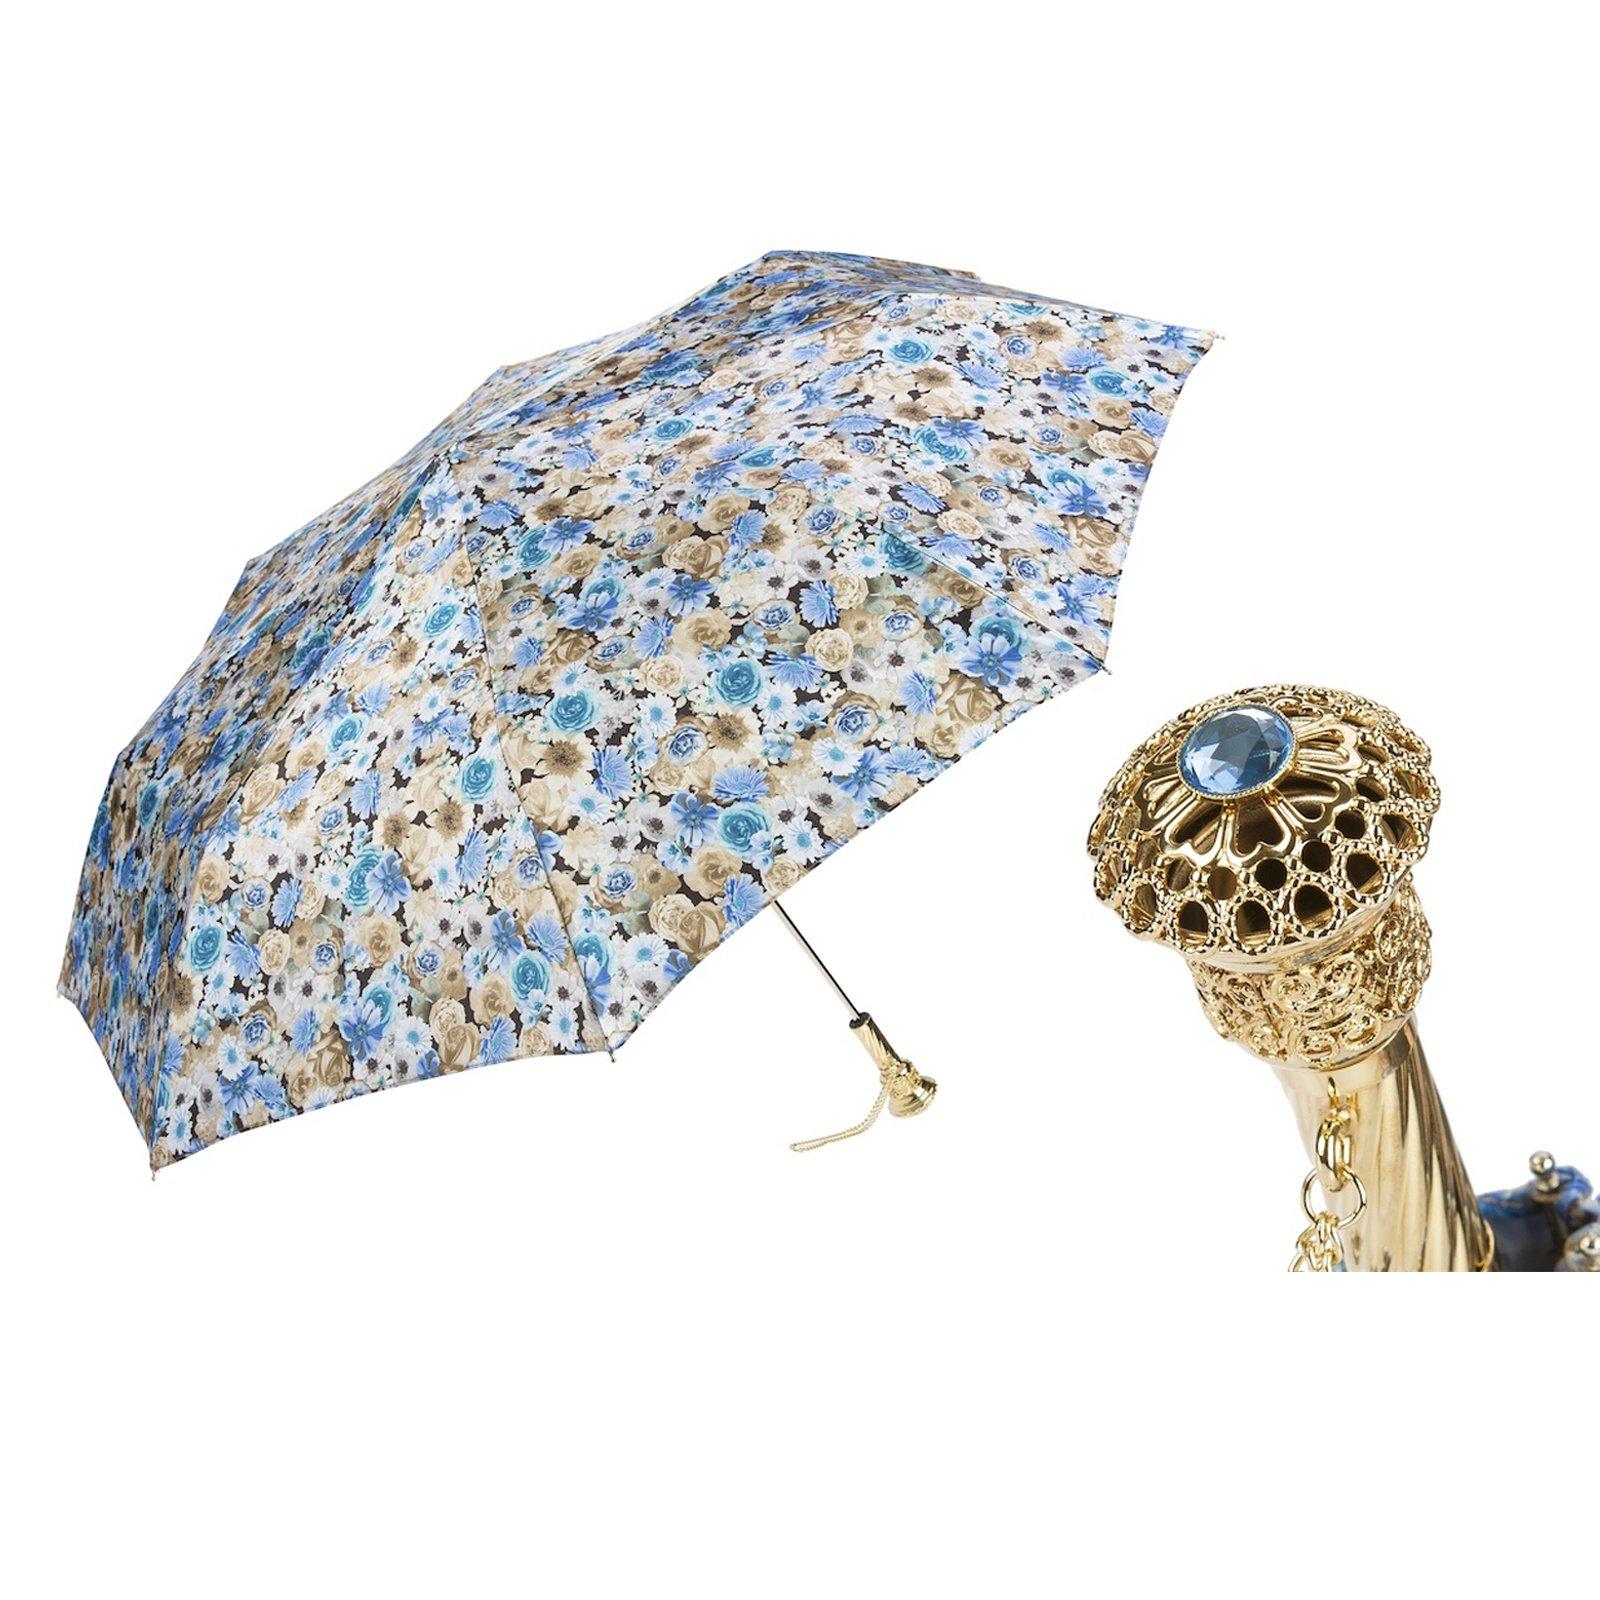 Pasotti Ombrelli Blue Flowers Folding Umbrella